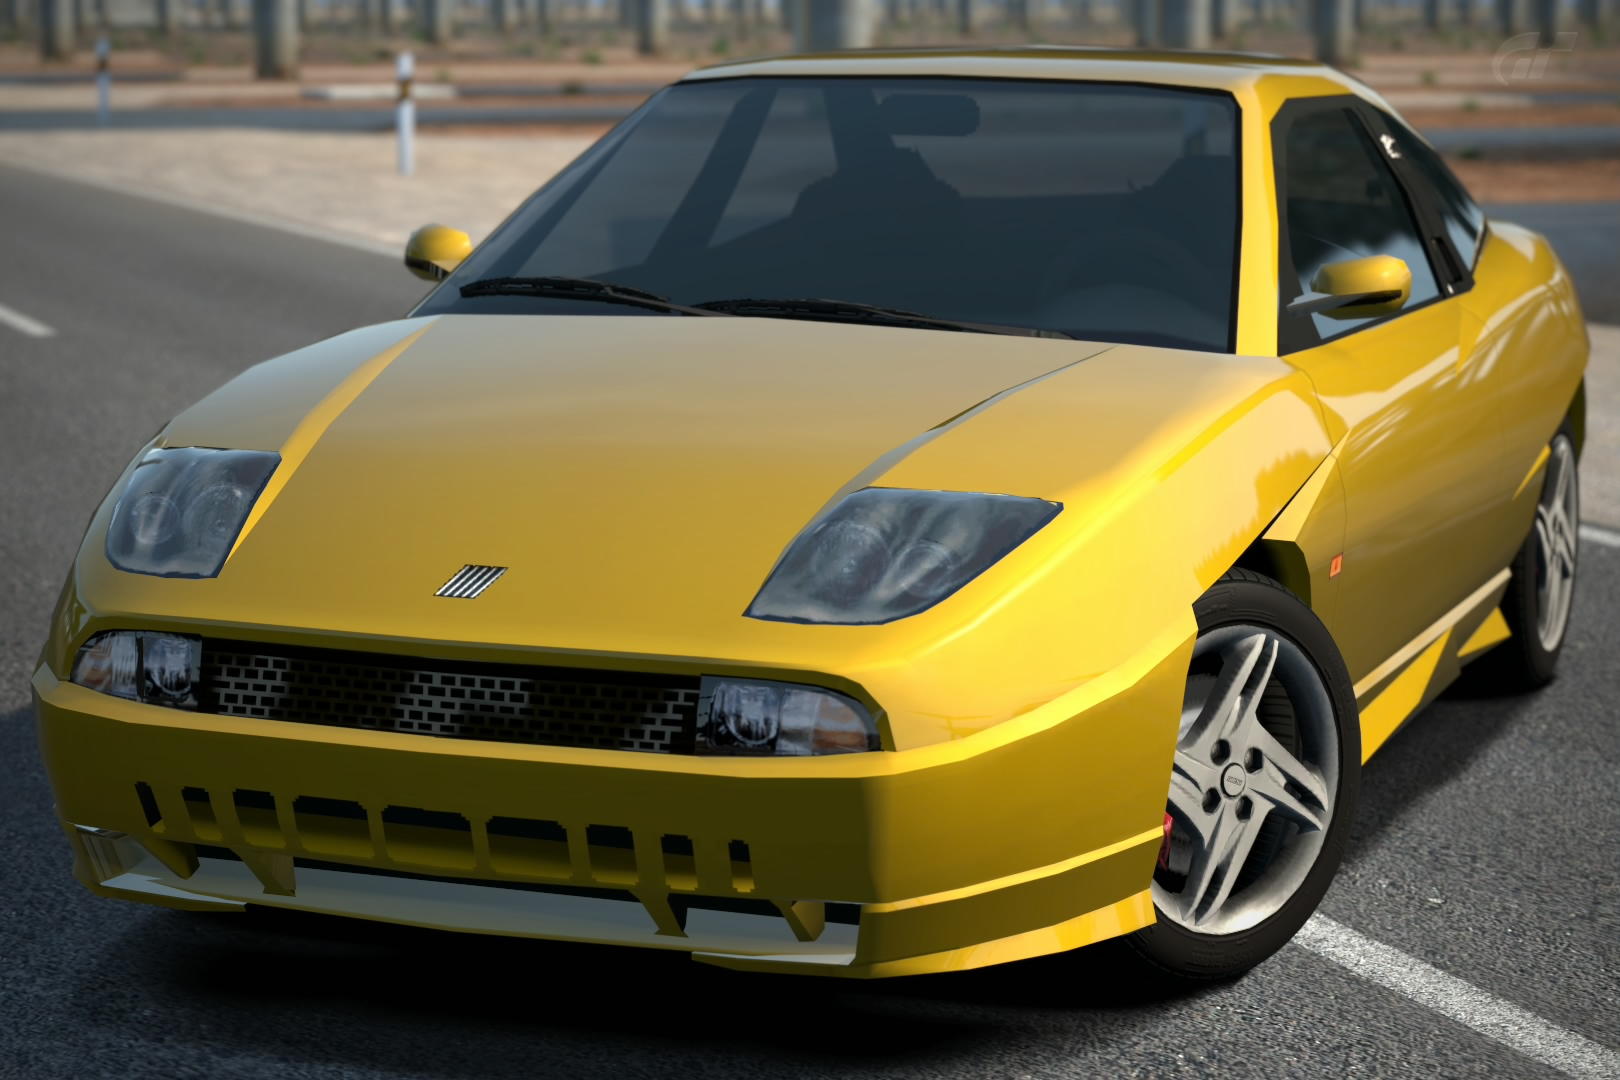 Fiat Coupe Turbo Plus '00